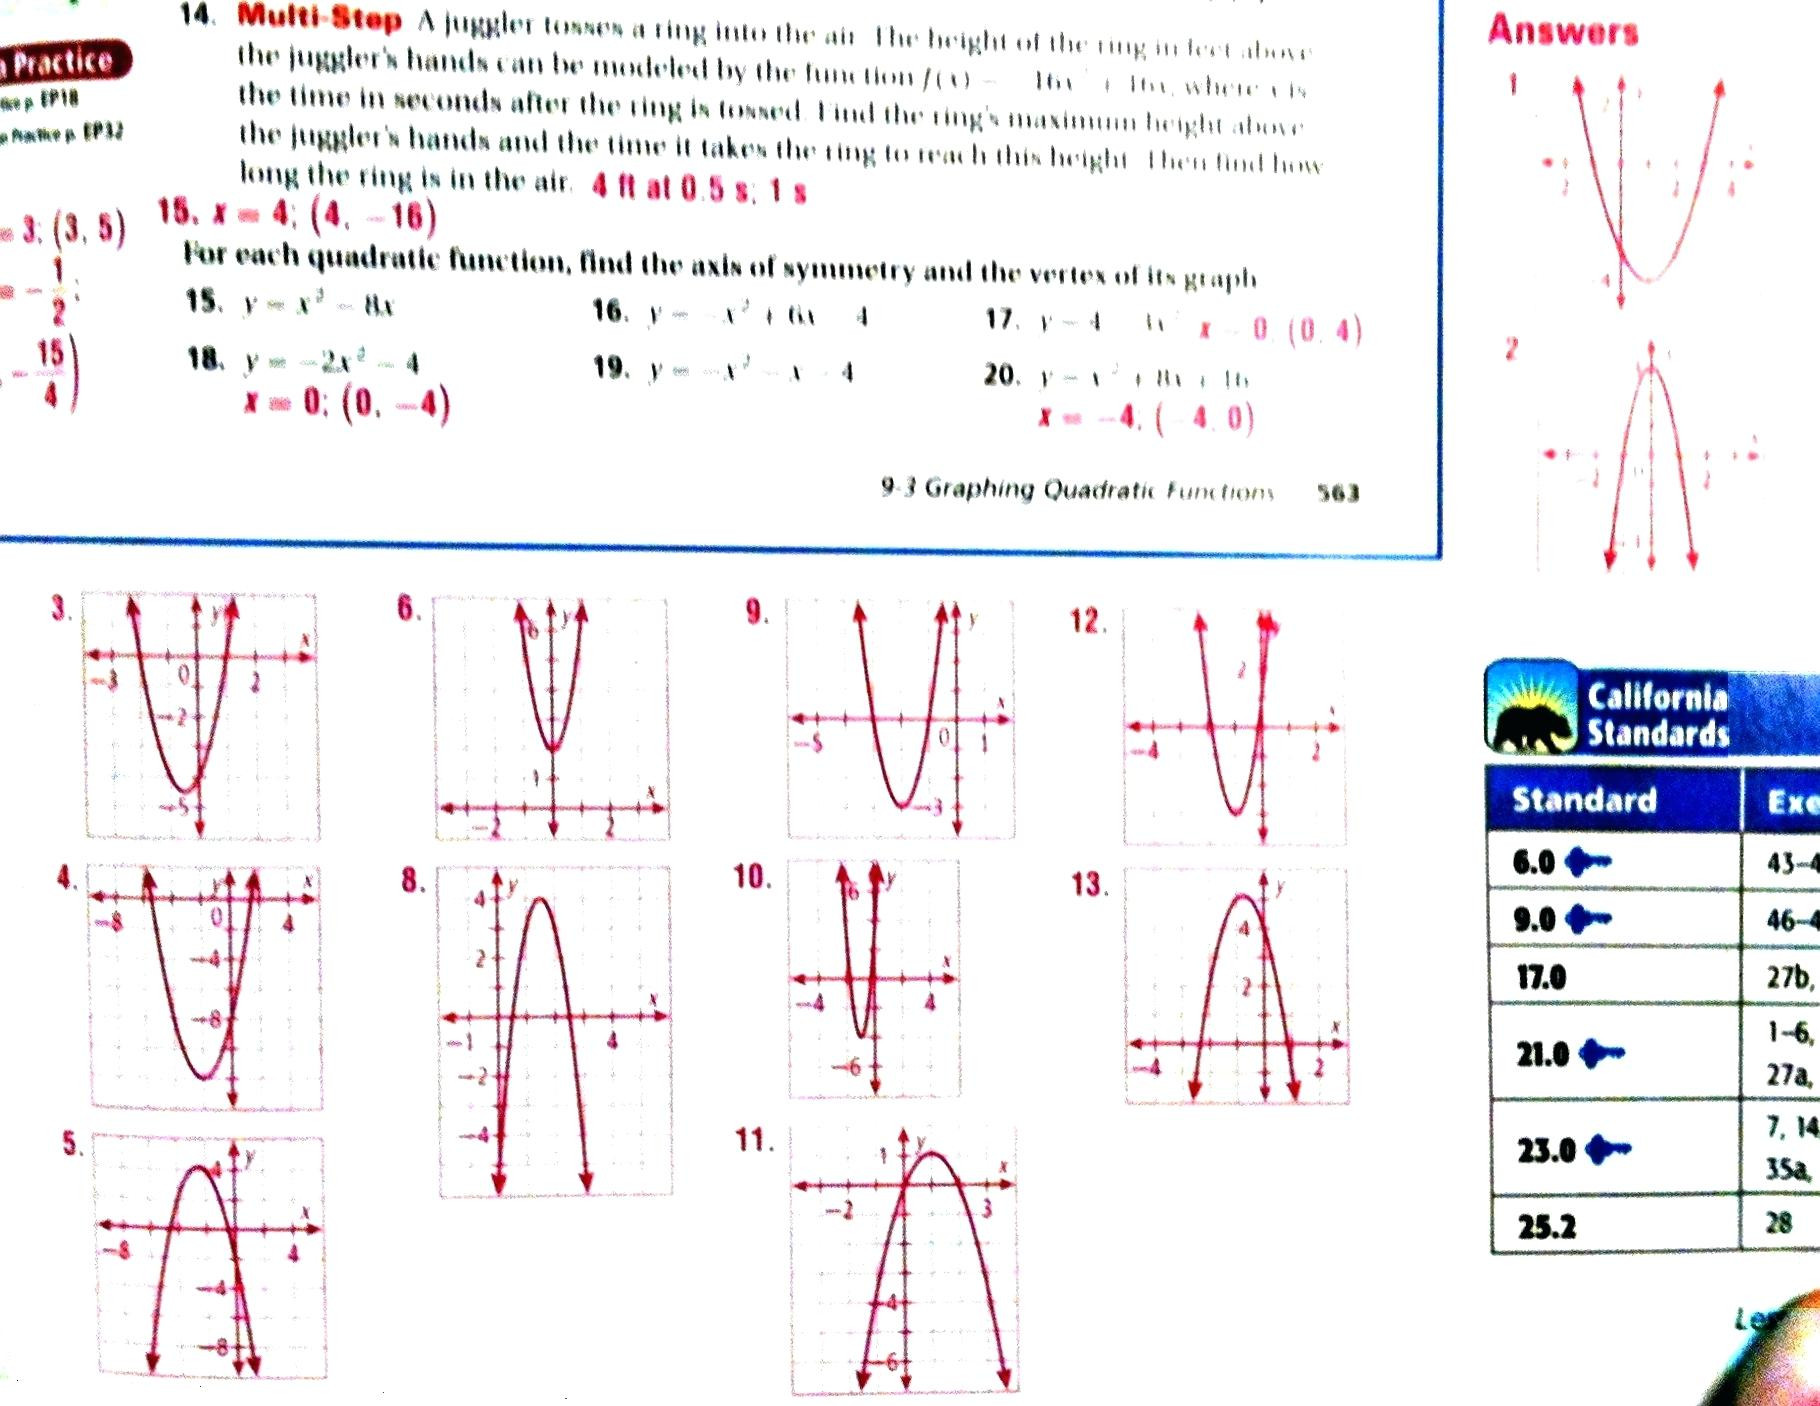 30 Graphing Quadratics Worksheet Answers